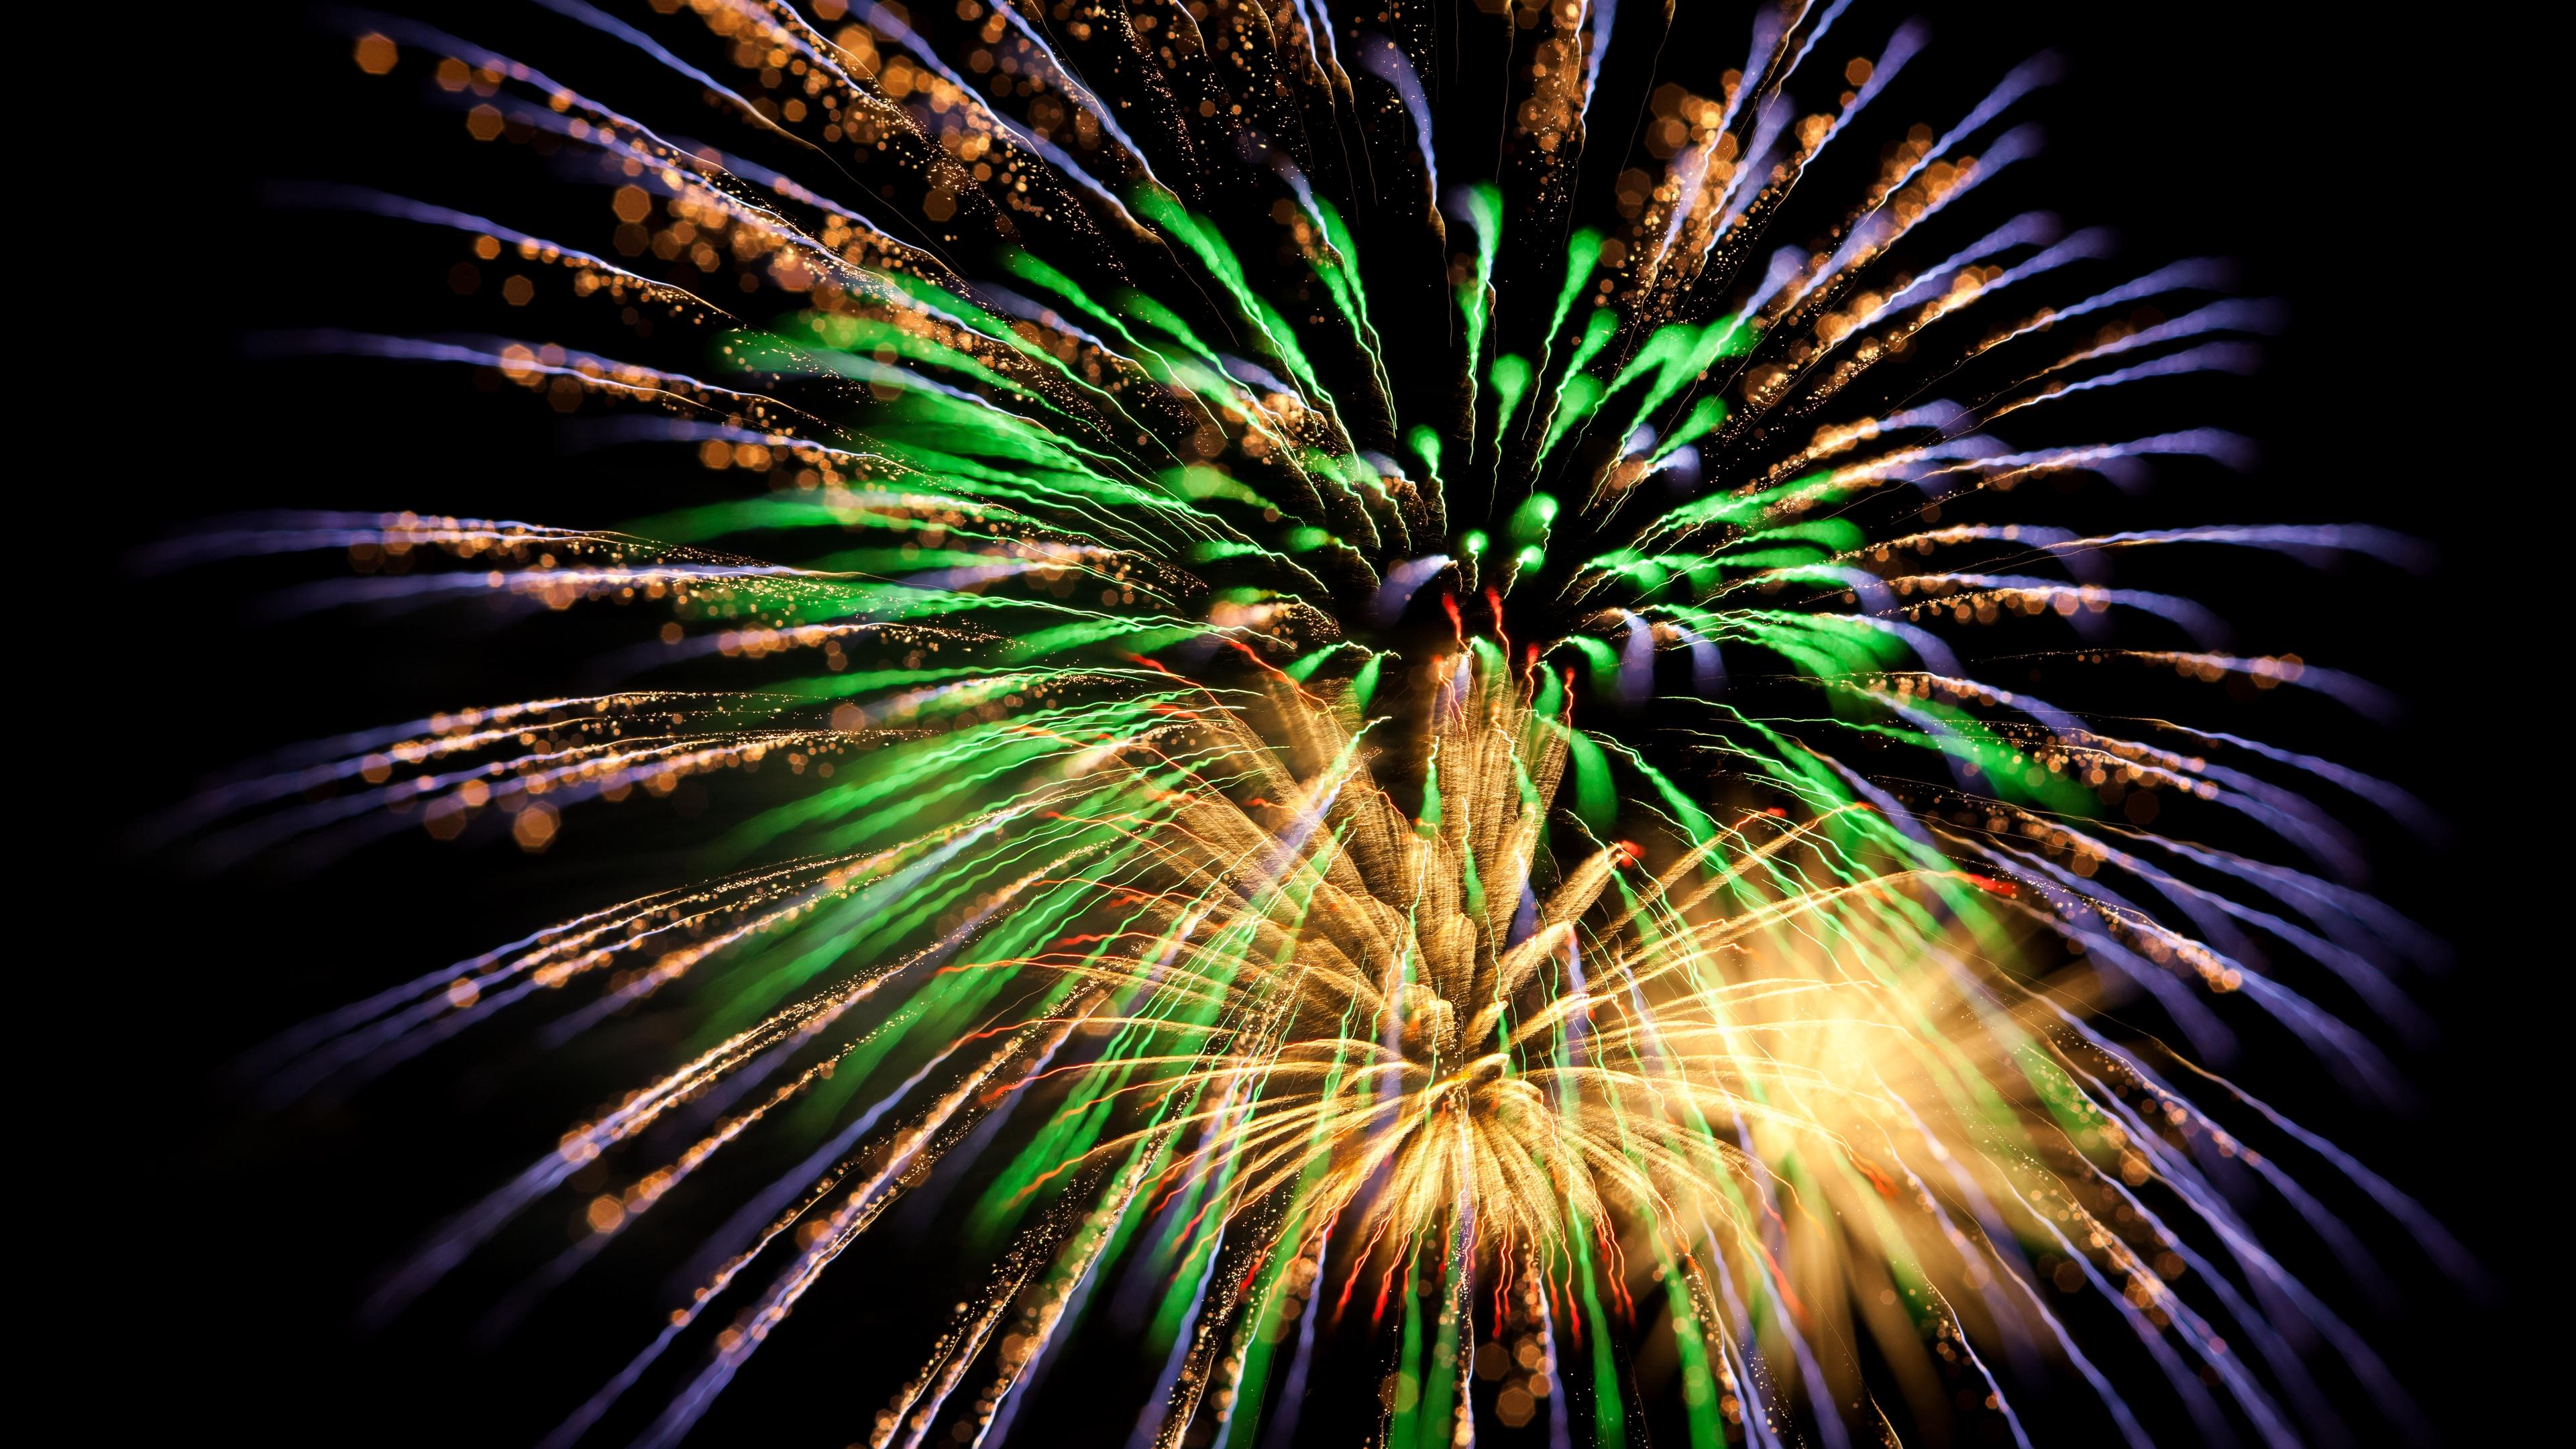 salute fireworks sparks green 4k 1538344627 - salute, fireworks, sparks, green 4k - Sparks, salute, Fireworks